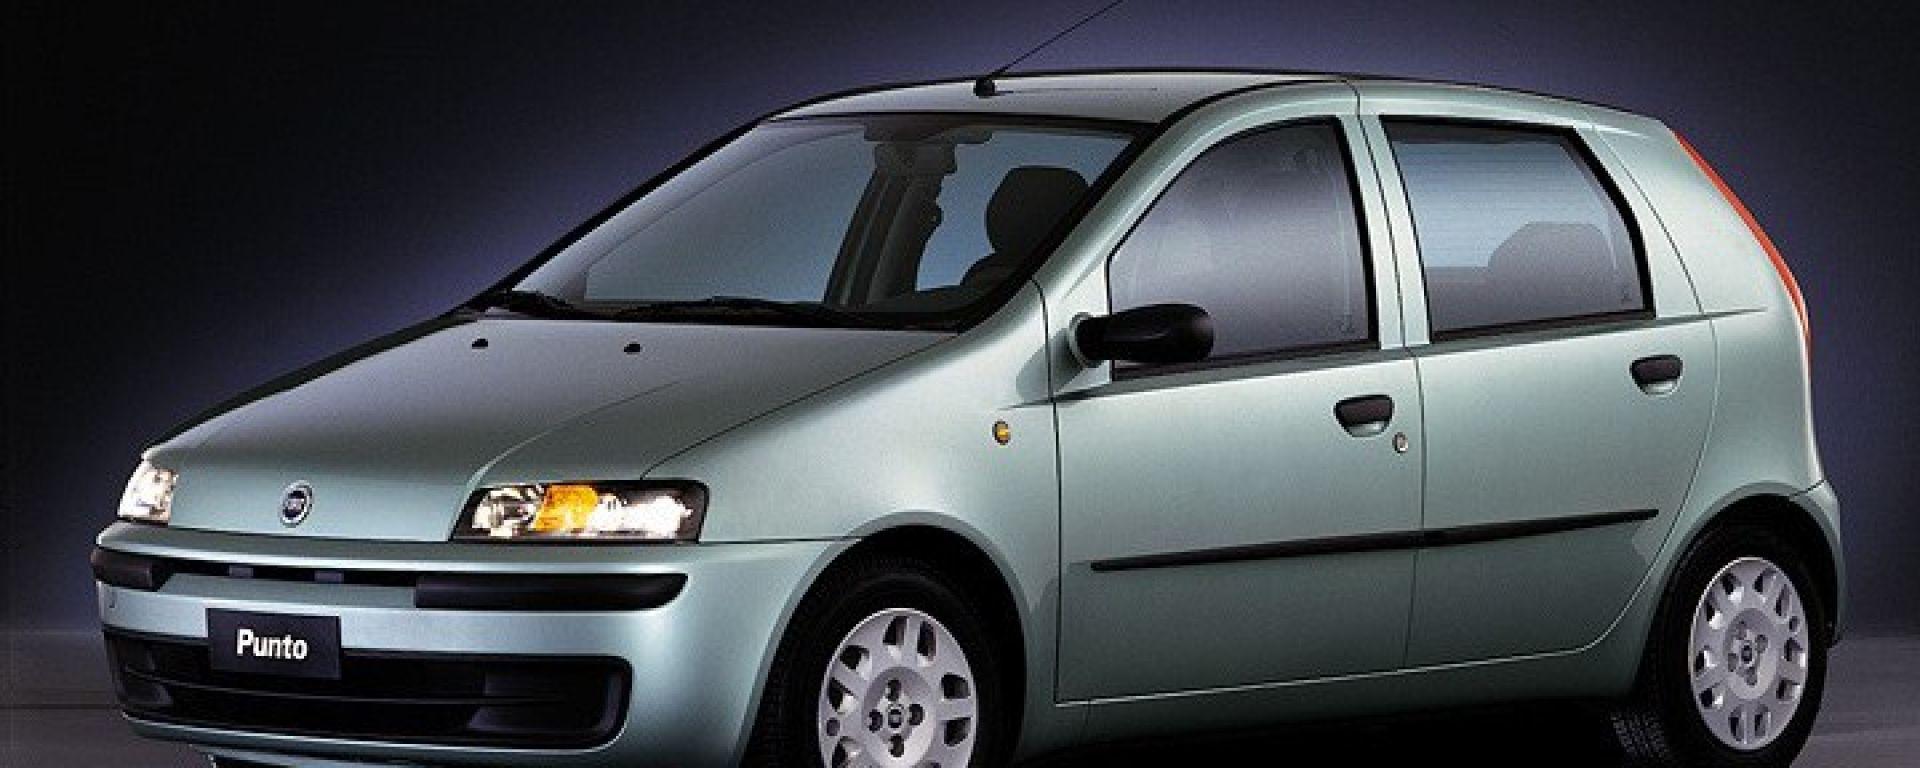 Prova su strada: Fiat Punto my 1999 - MotorBox on fiat panda, fiat barchetta, fiat ritmo, fiat x1/9, fiat stilo, fiat multipla, fiat seicento, fiat 500 abarth, fiat cinquecento, fiat cars, fiat 500 turbo, fiat doblo, fiat spider, fiat coupe, fiat 500l, fiat linea, fiat marea, fiat bravo,